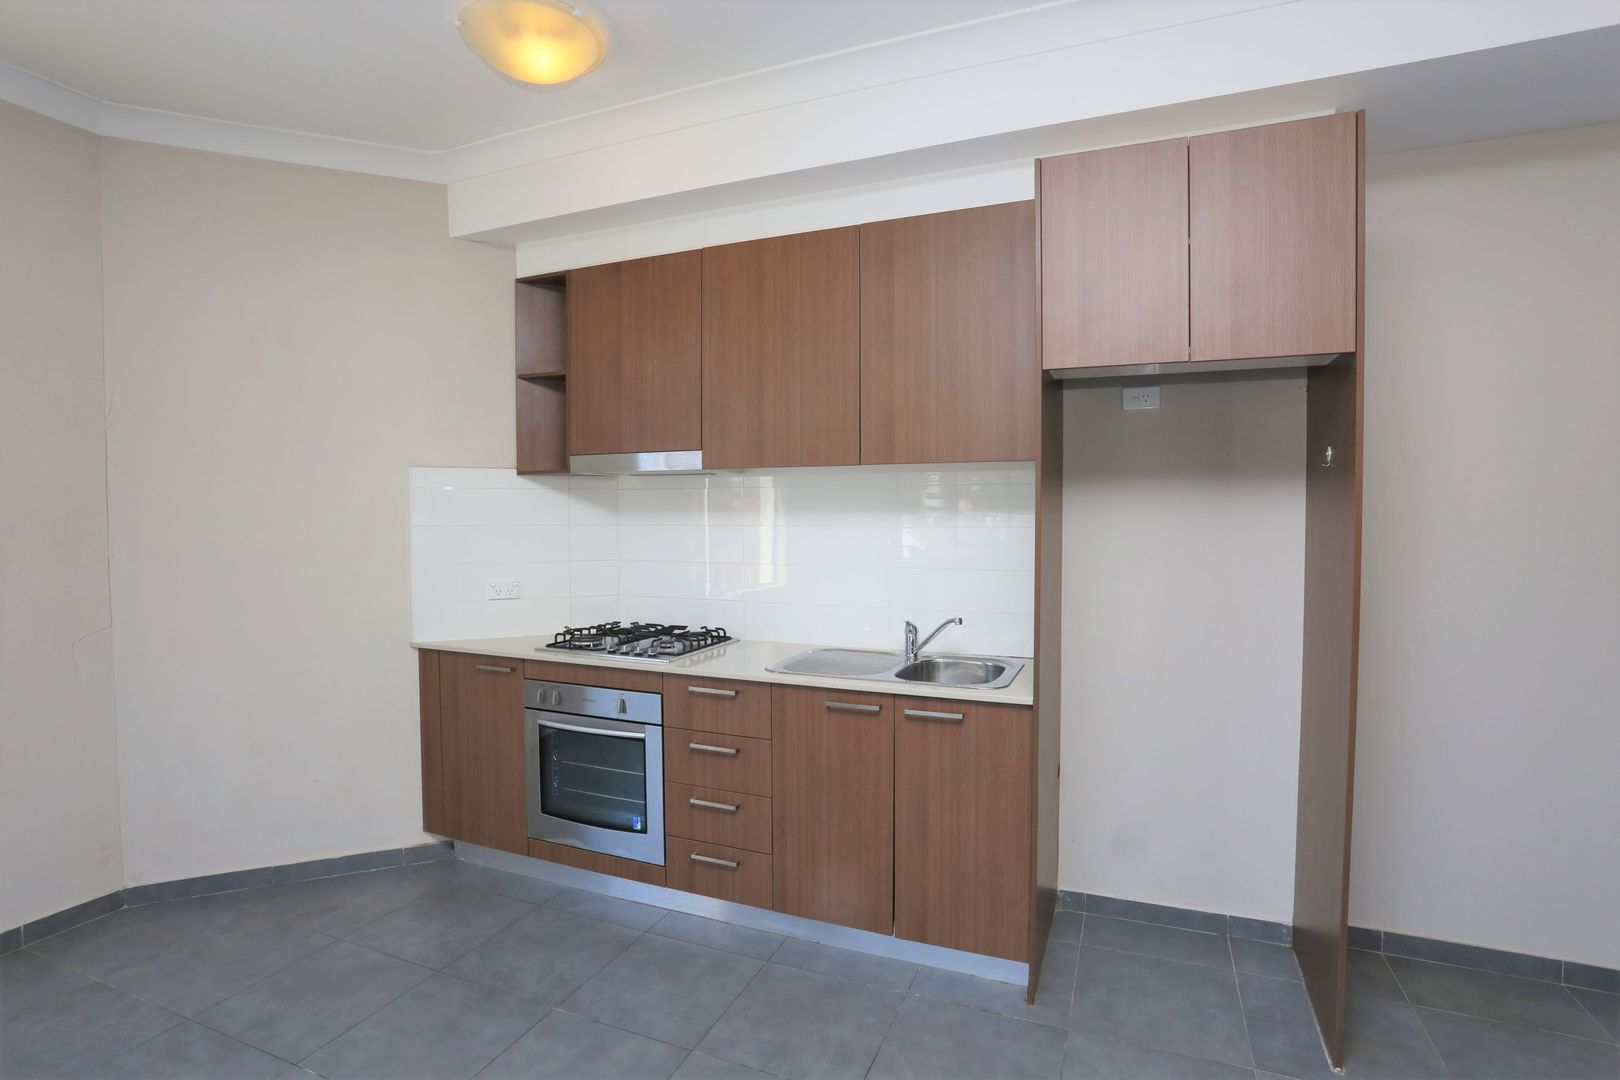 S3/46 Borrodale Road, Kingsford NSW 2032, Image 1